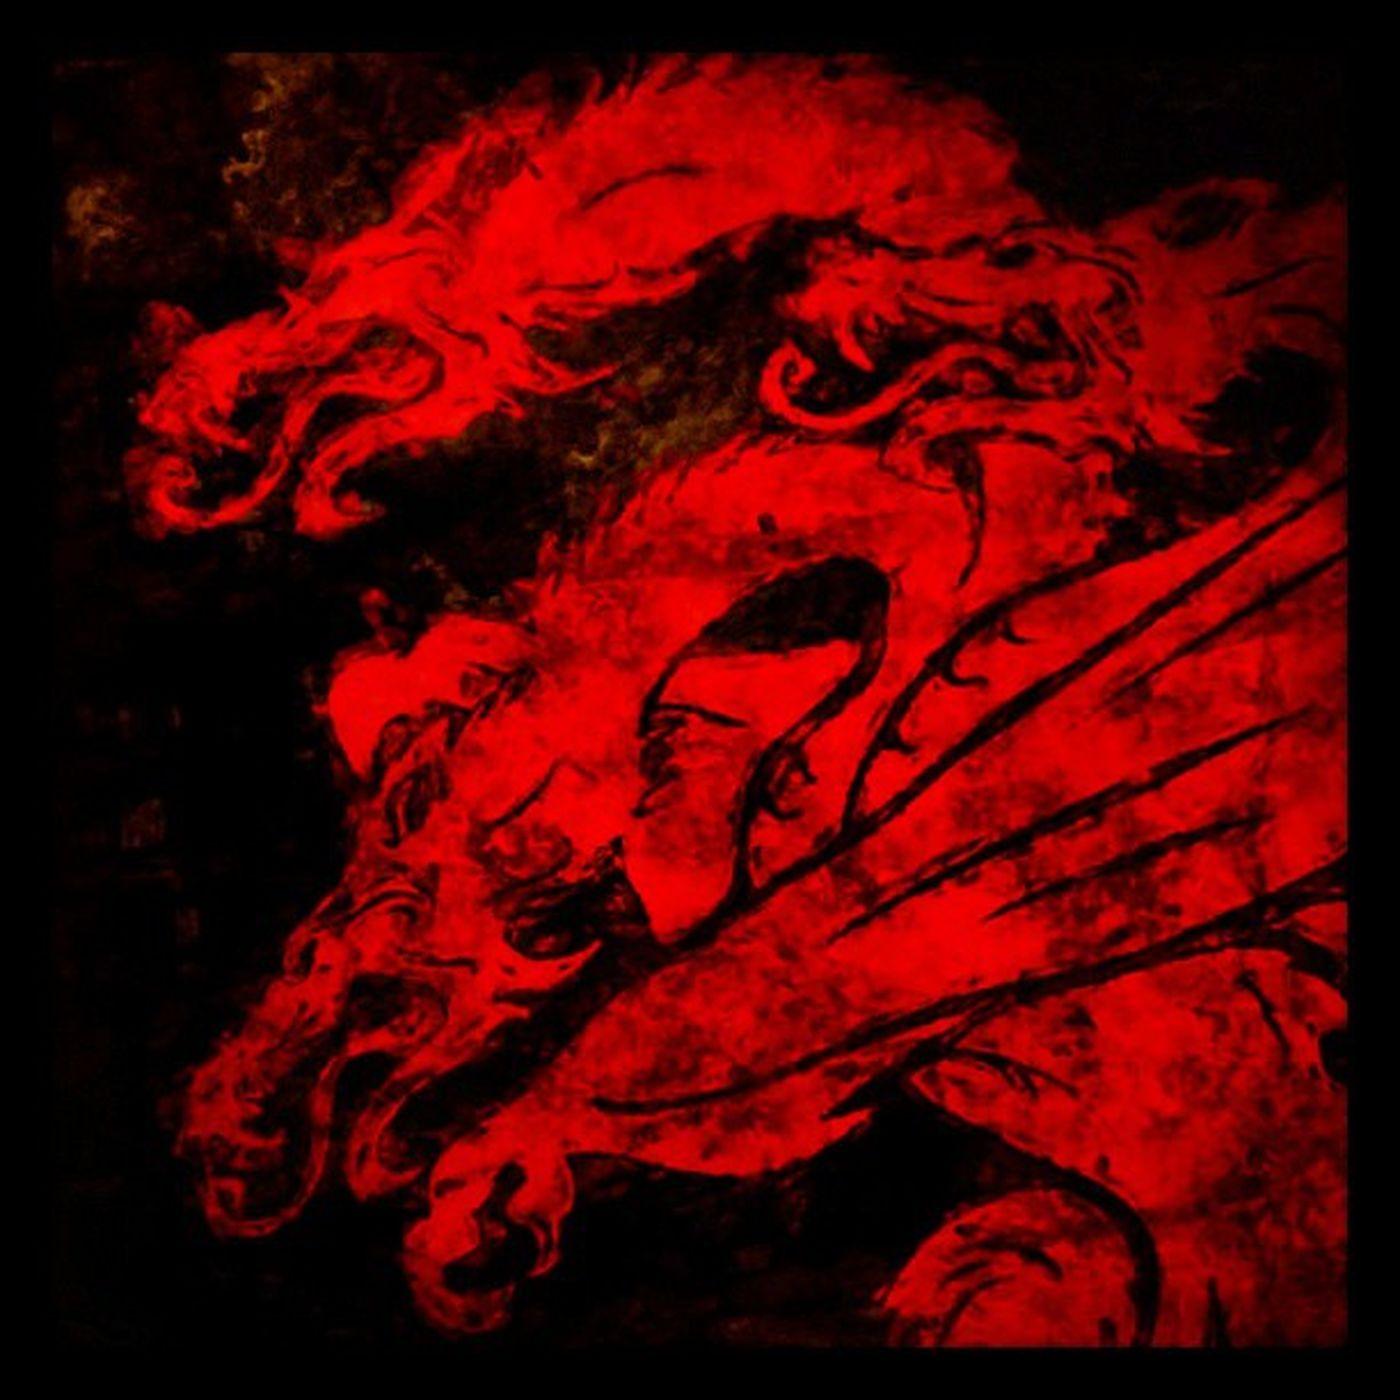 House Targaryen. HouseTargaryen Targaryen Dragon Dragao Daenerys Gameofthrones Asongoficeandfire Iphonesia Aegon Instafollow Instafollowback Photooftheday Picoftheday Instagood Tatoo Red Reddragon Valyria